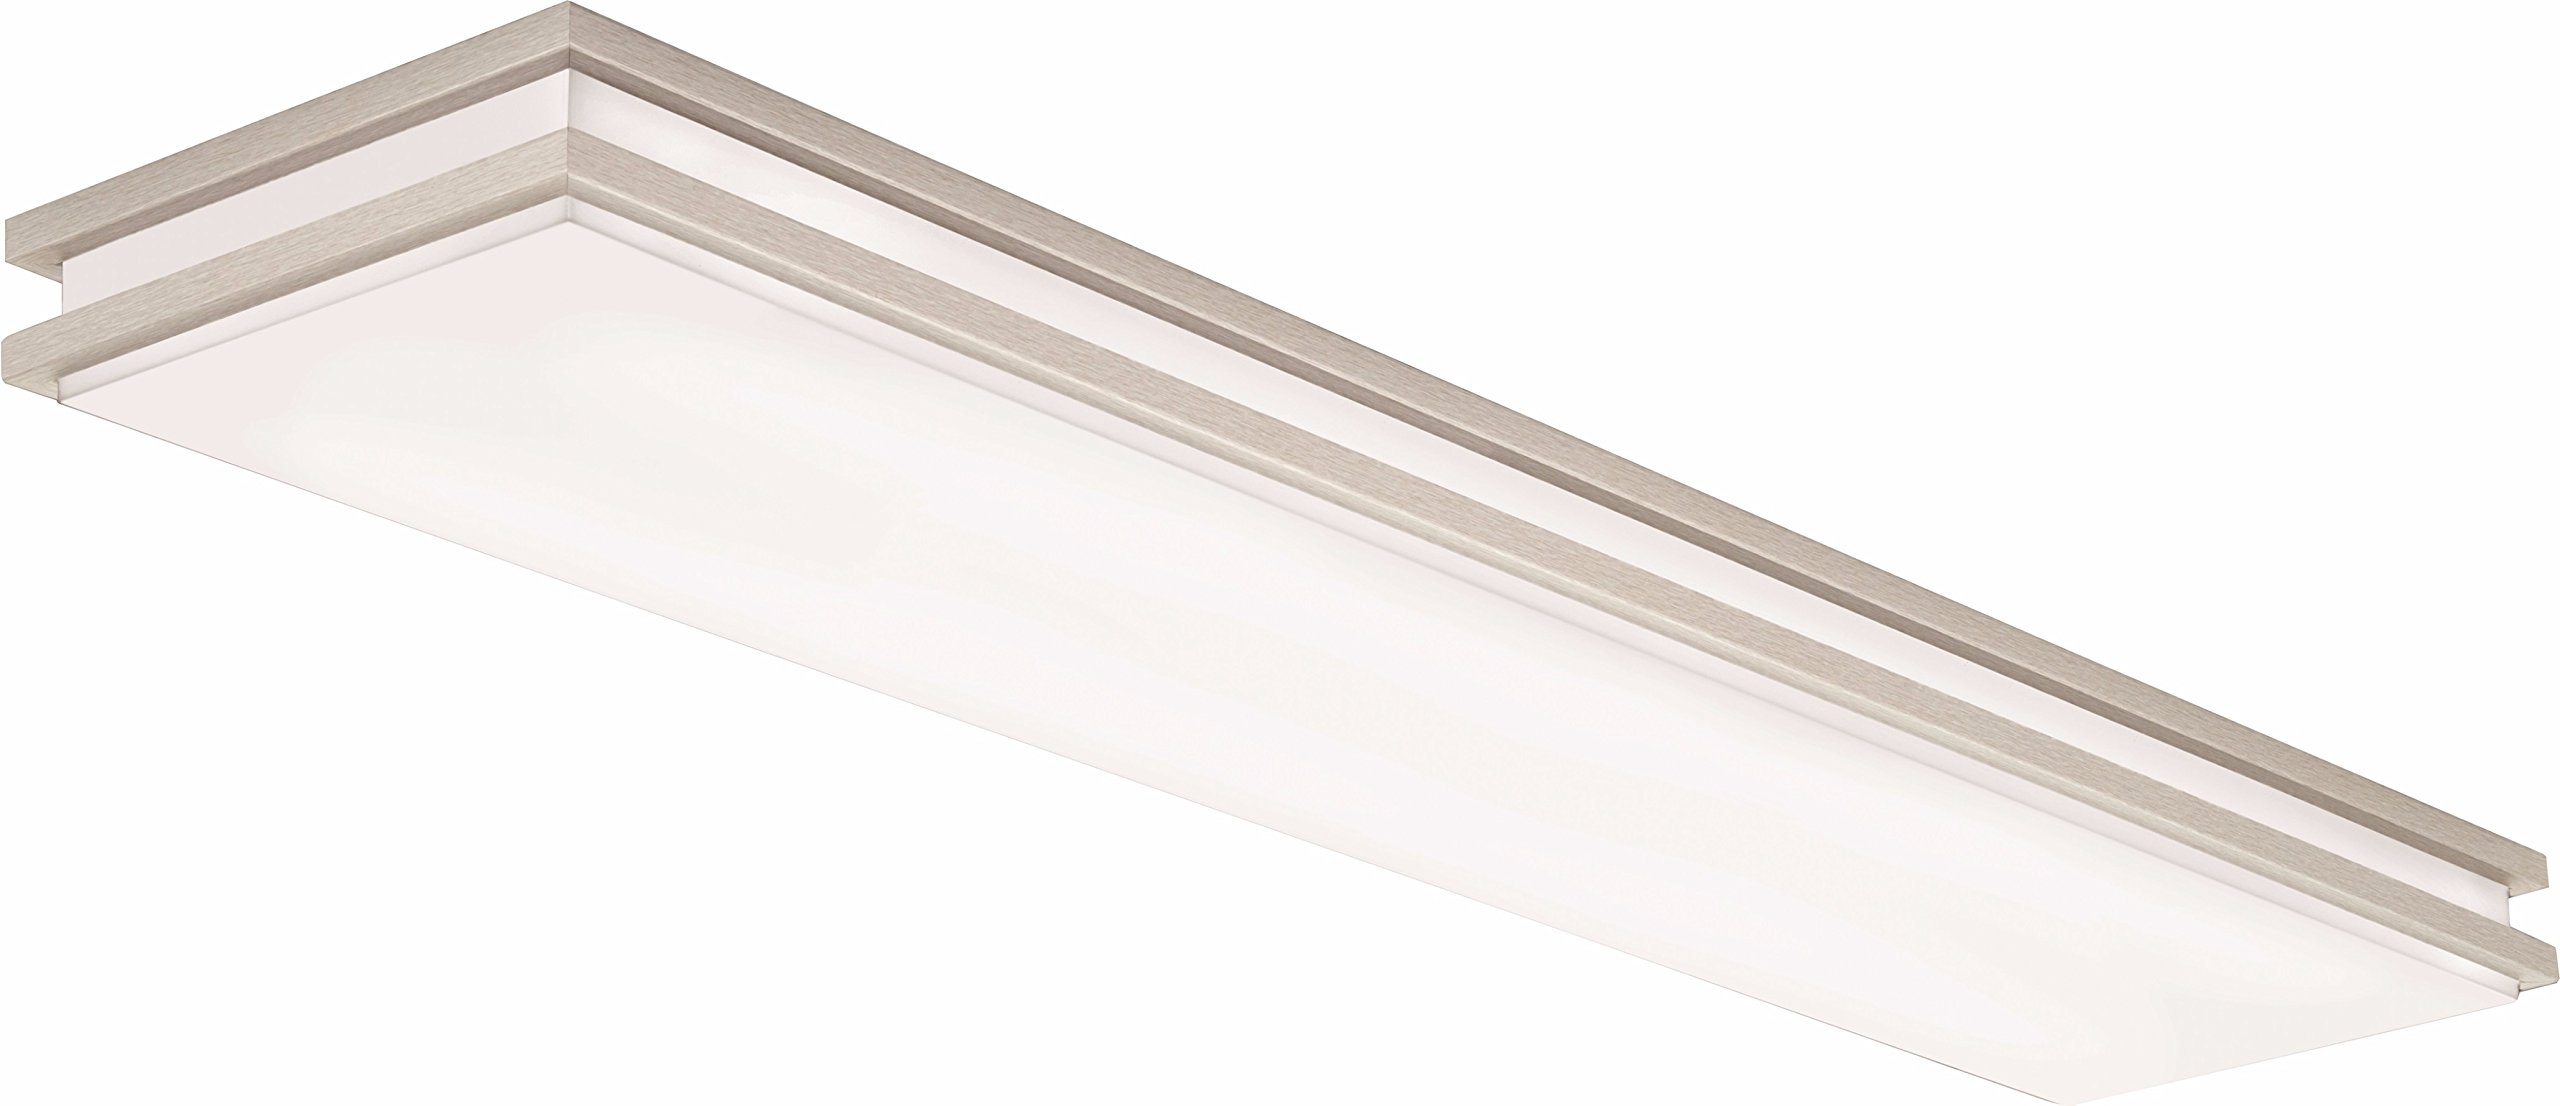 Lithonia Lighting Brushed Nickel 4-Ft LED Flush Mount, 4000K, 35.5W, 2,560 Lumens